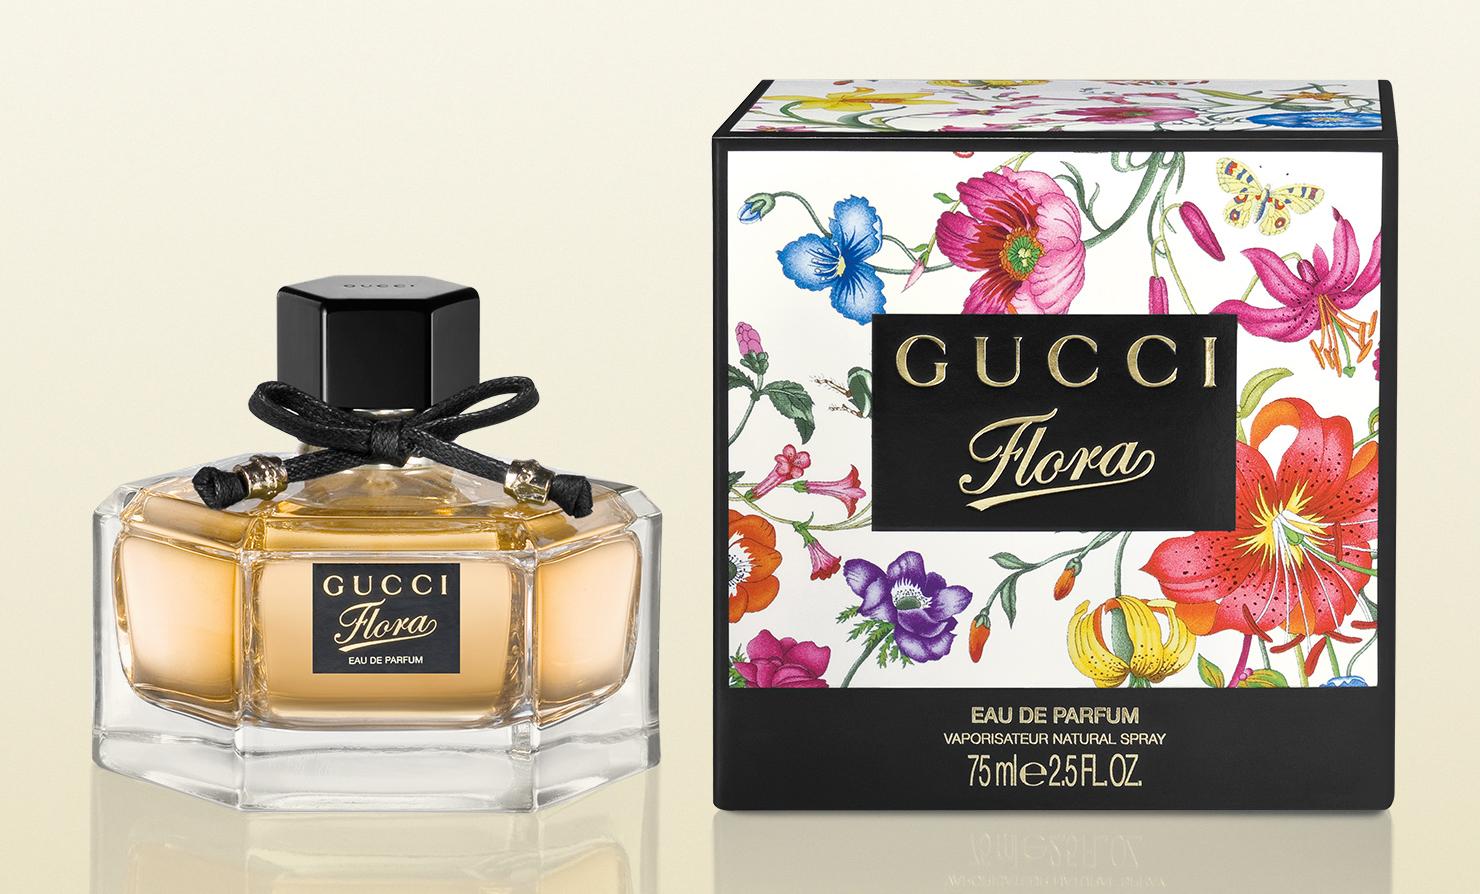 Flora by Gucci Eau de Parfum Gucci perfume - una fragancia para ... 243cdc9343b